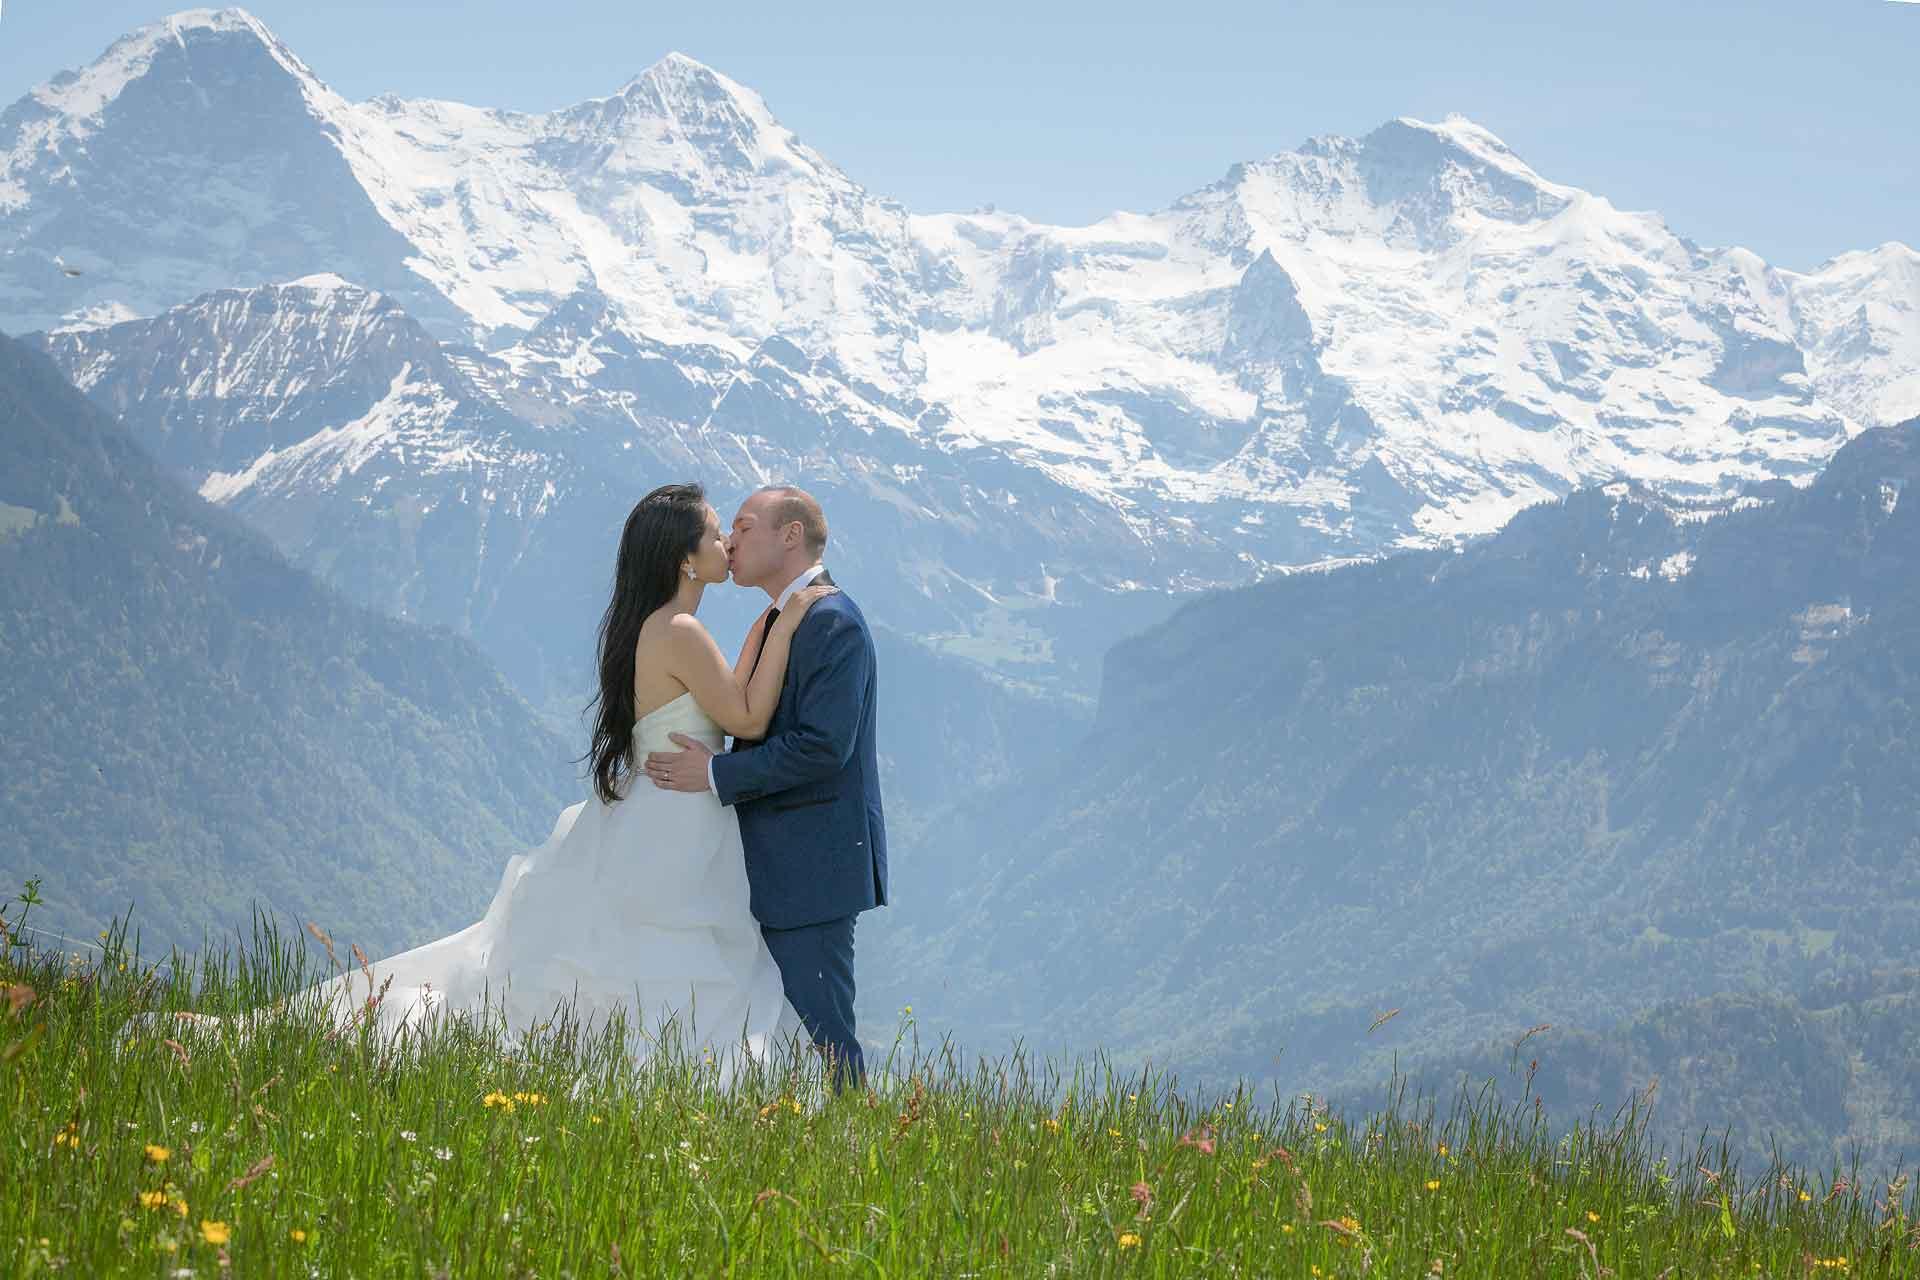 Swiss Alps Bridal Photo Shoot